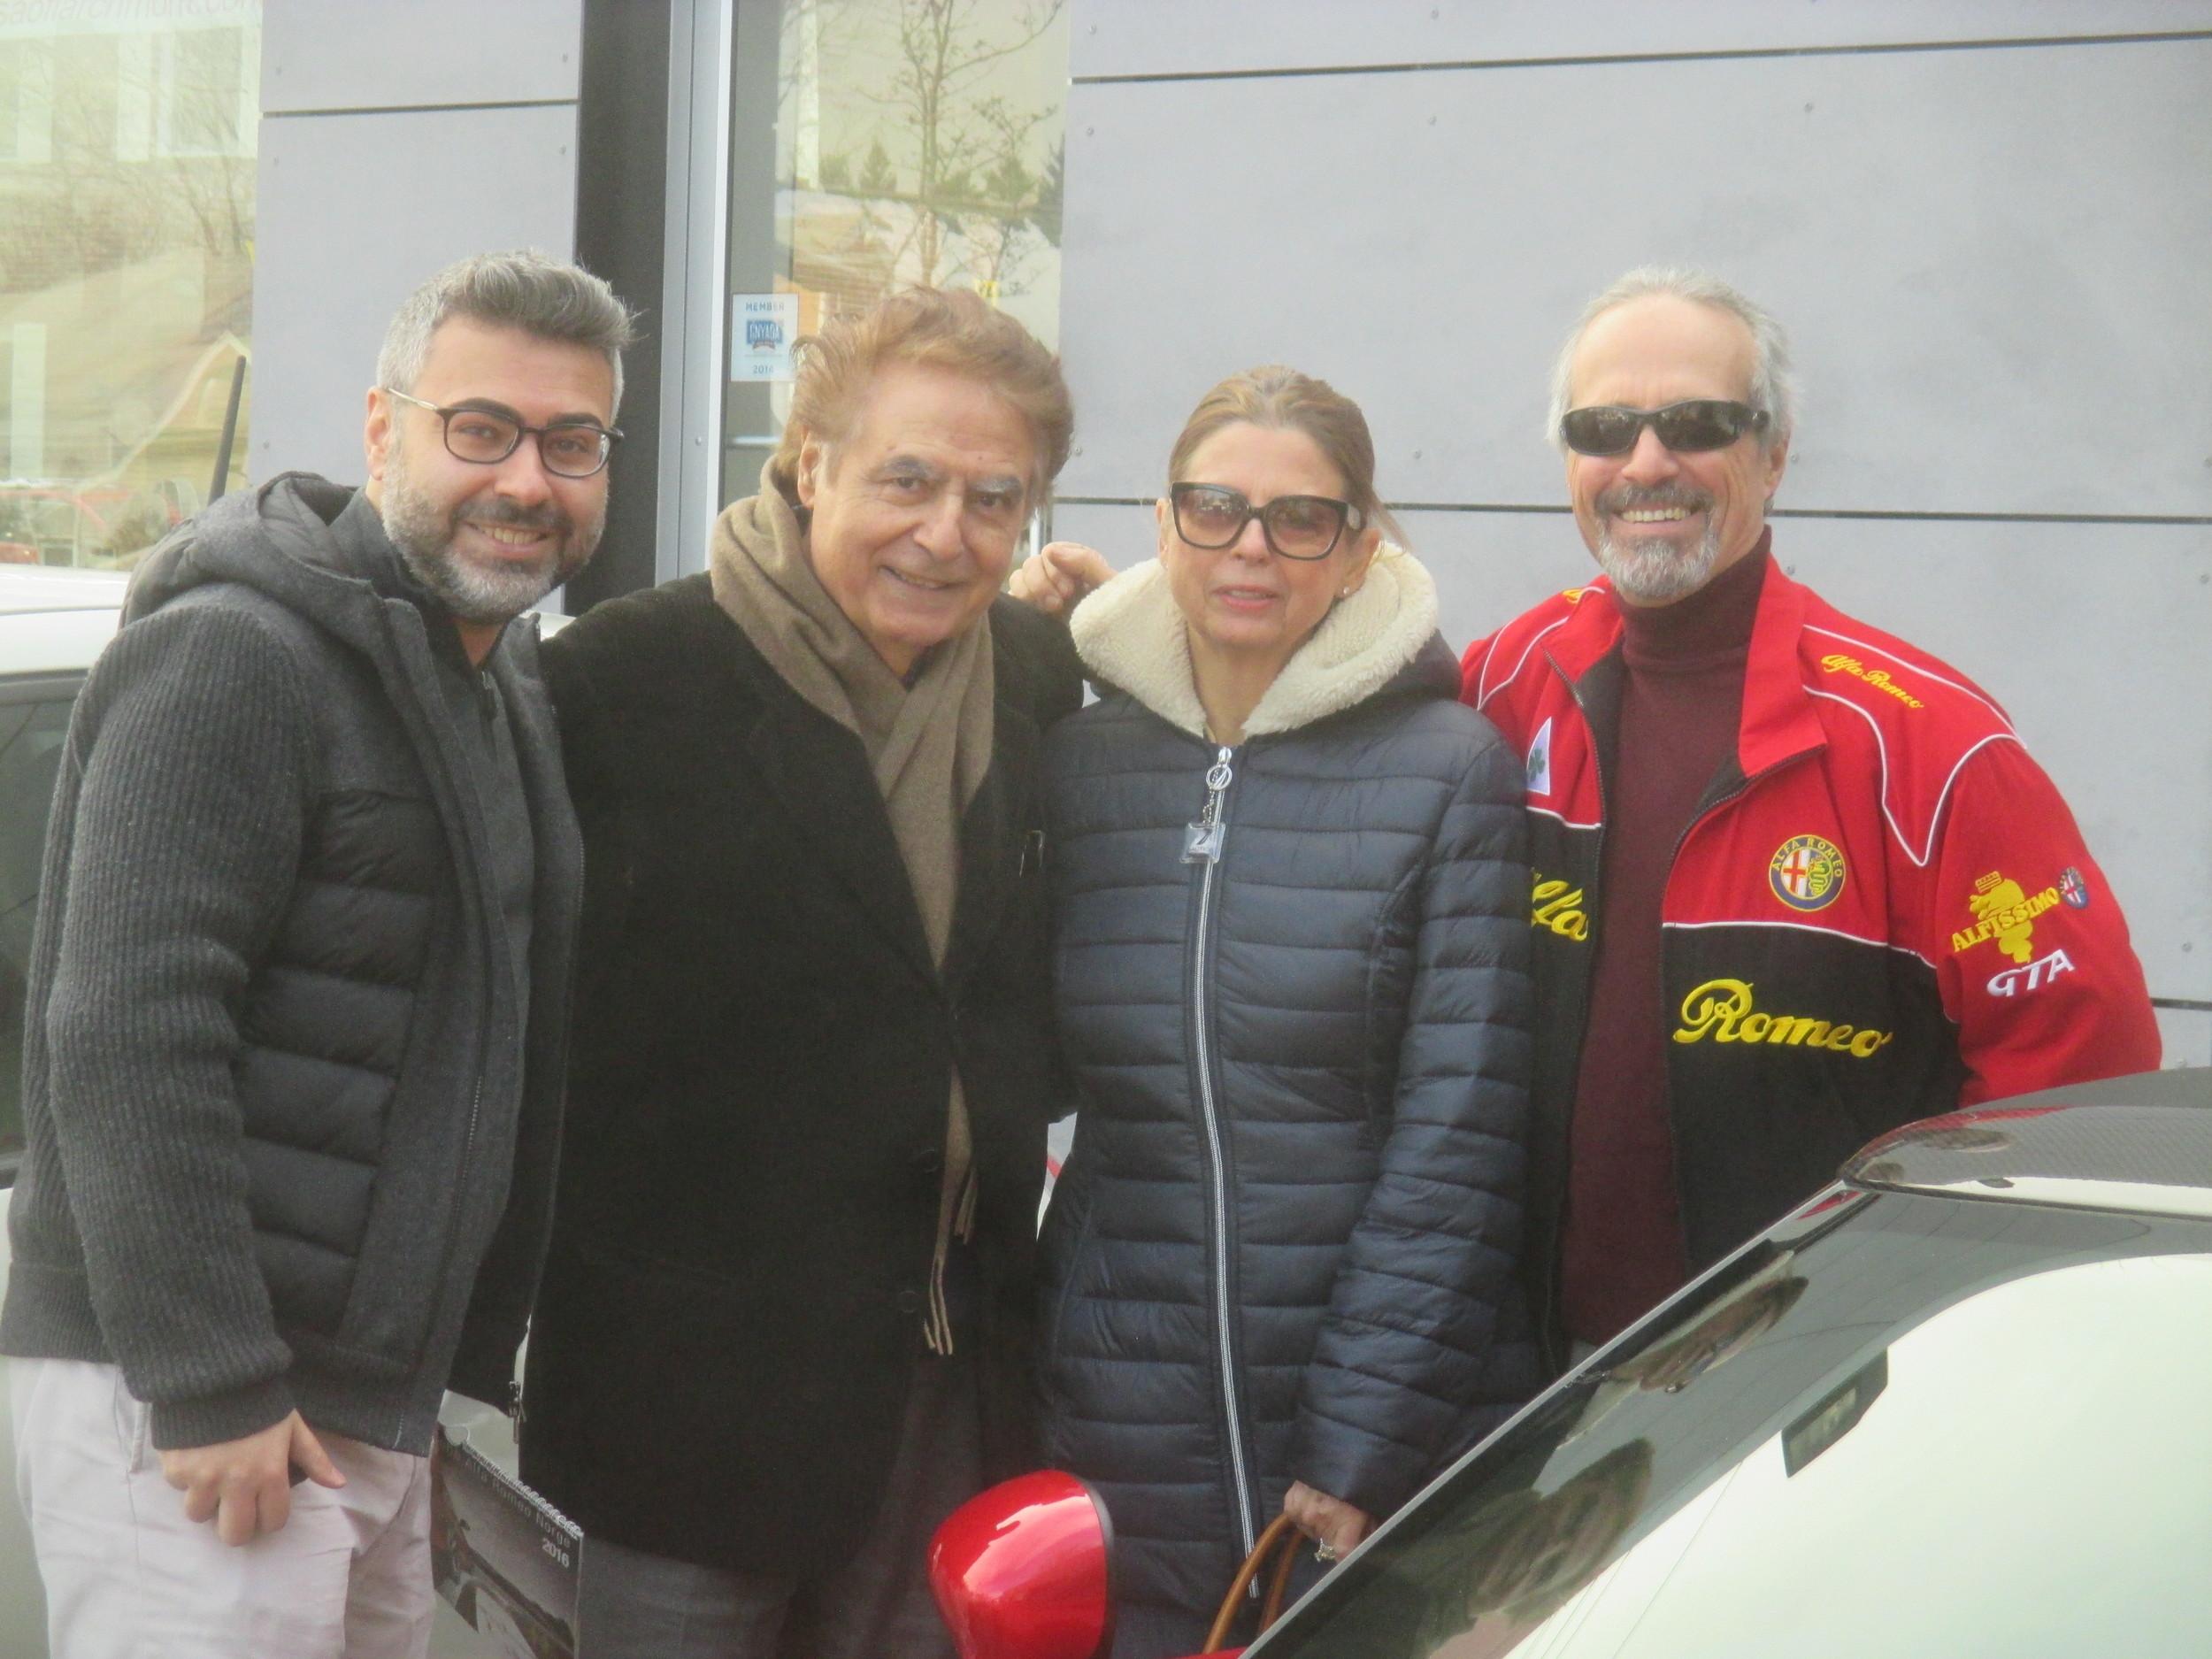 Fernando & Alfredo Gulla plus Gail & Vic Cerami.